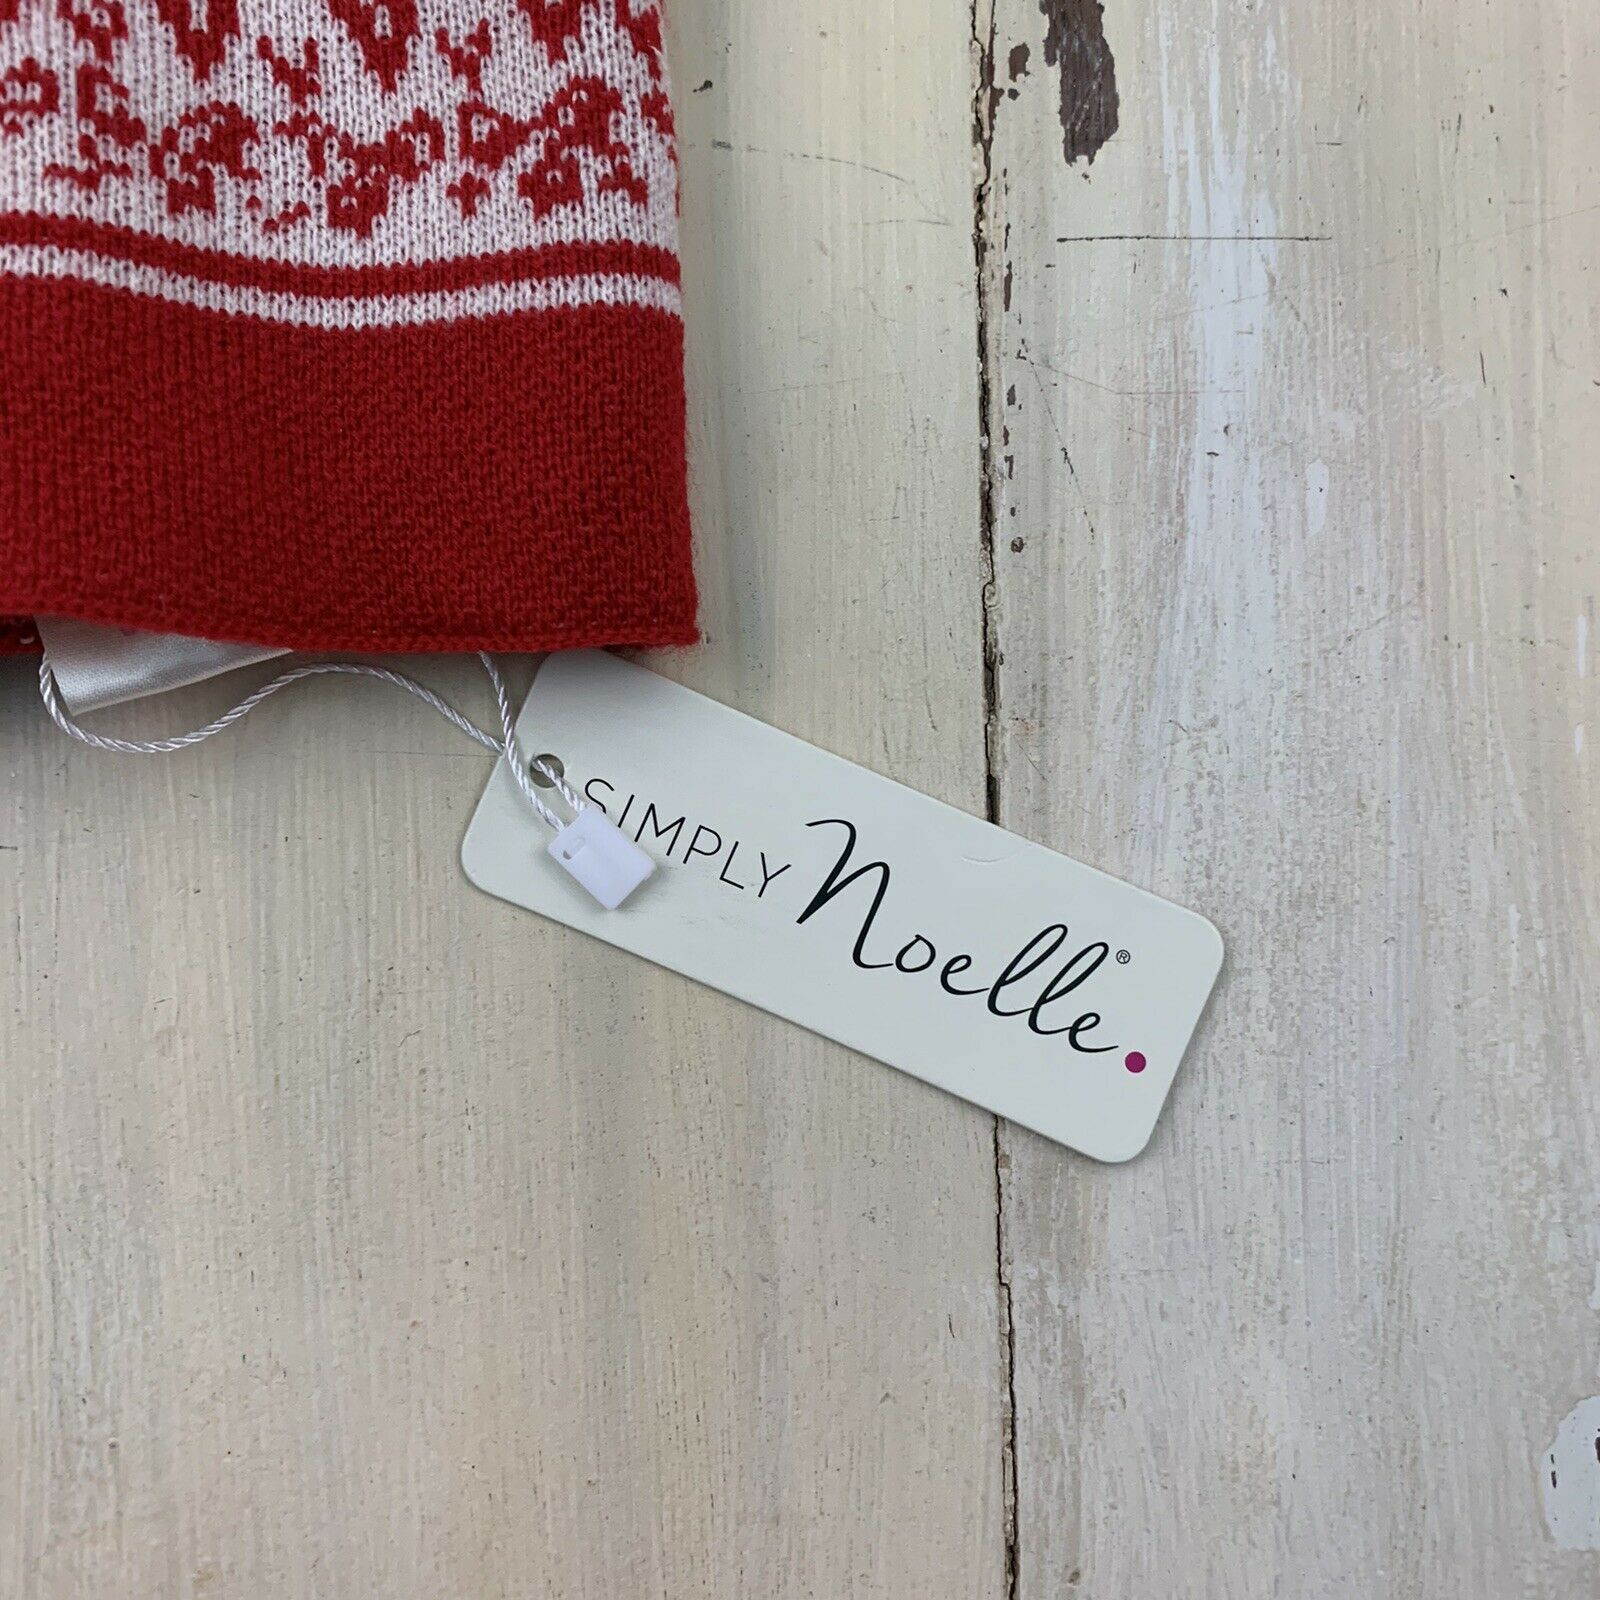 SIMPLY NOELLE: Red & White Winter Acrylic Scarf, Fingerless Gloves, Headband Set